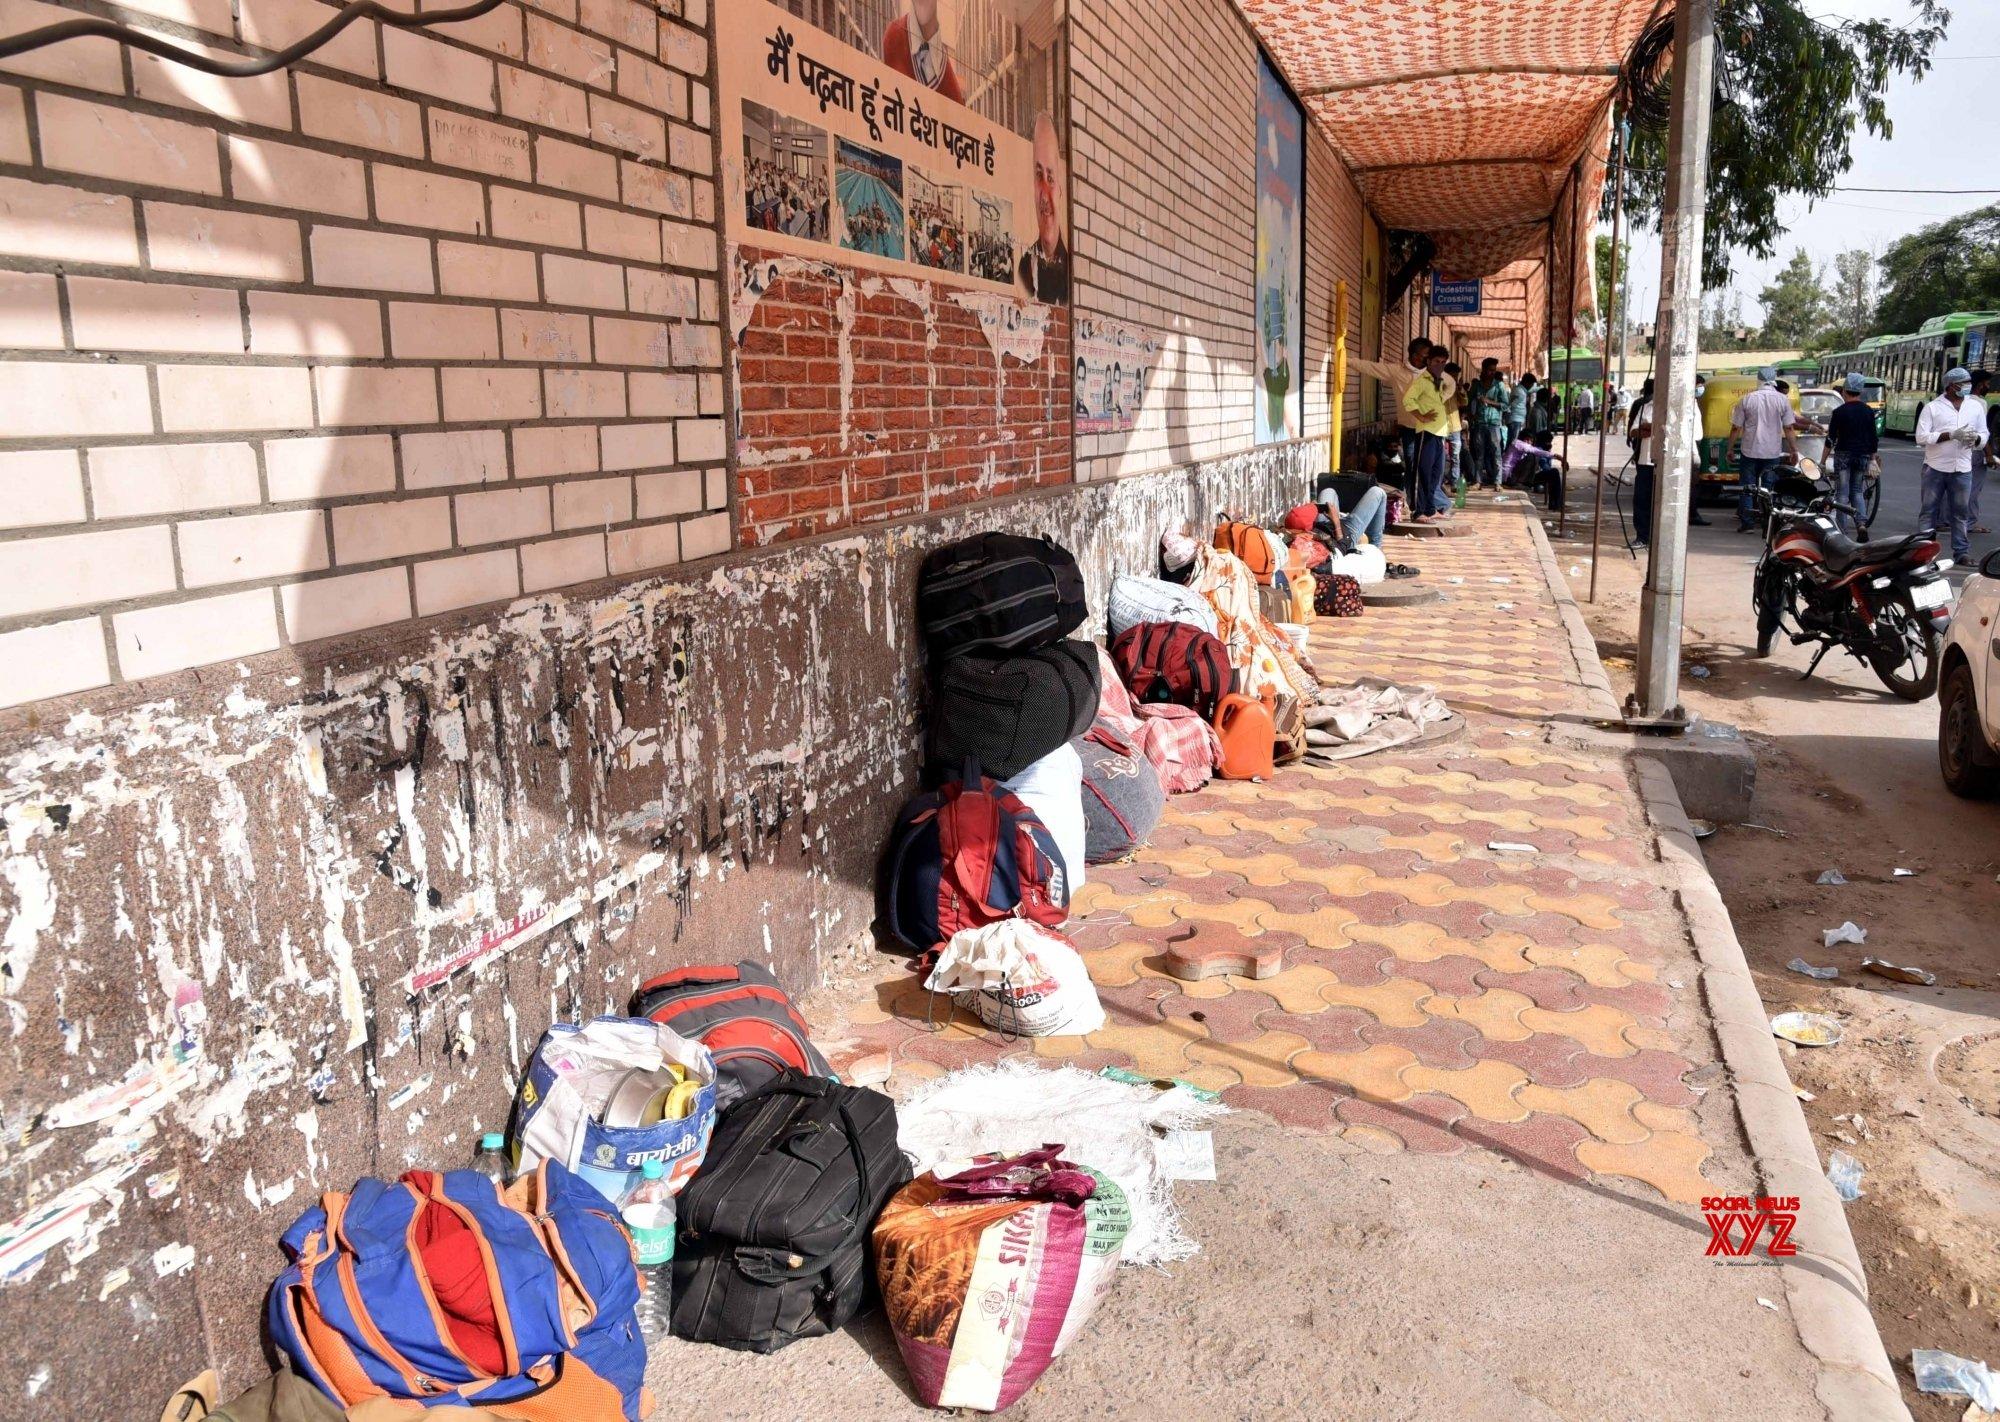 New Delhi: Migrant workers heading home gather at East Vinod Nagar school for medical screening #Gallery